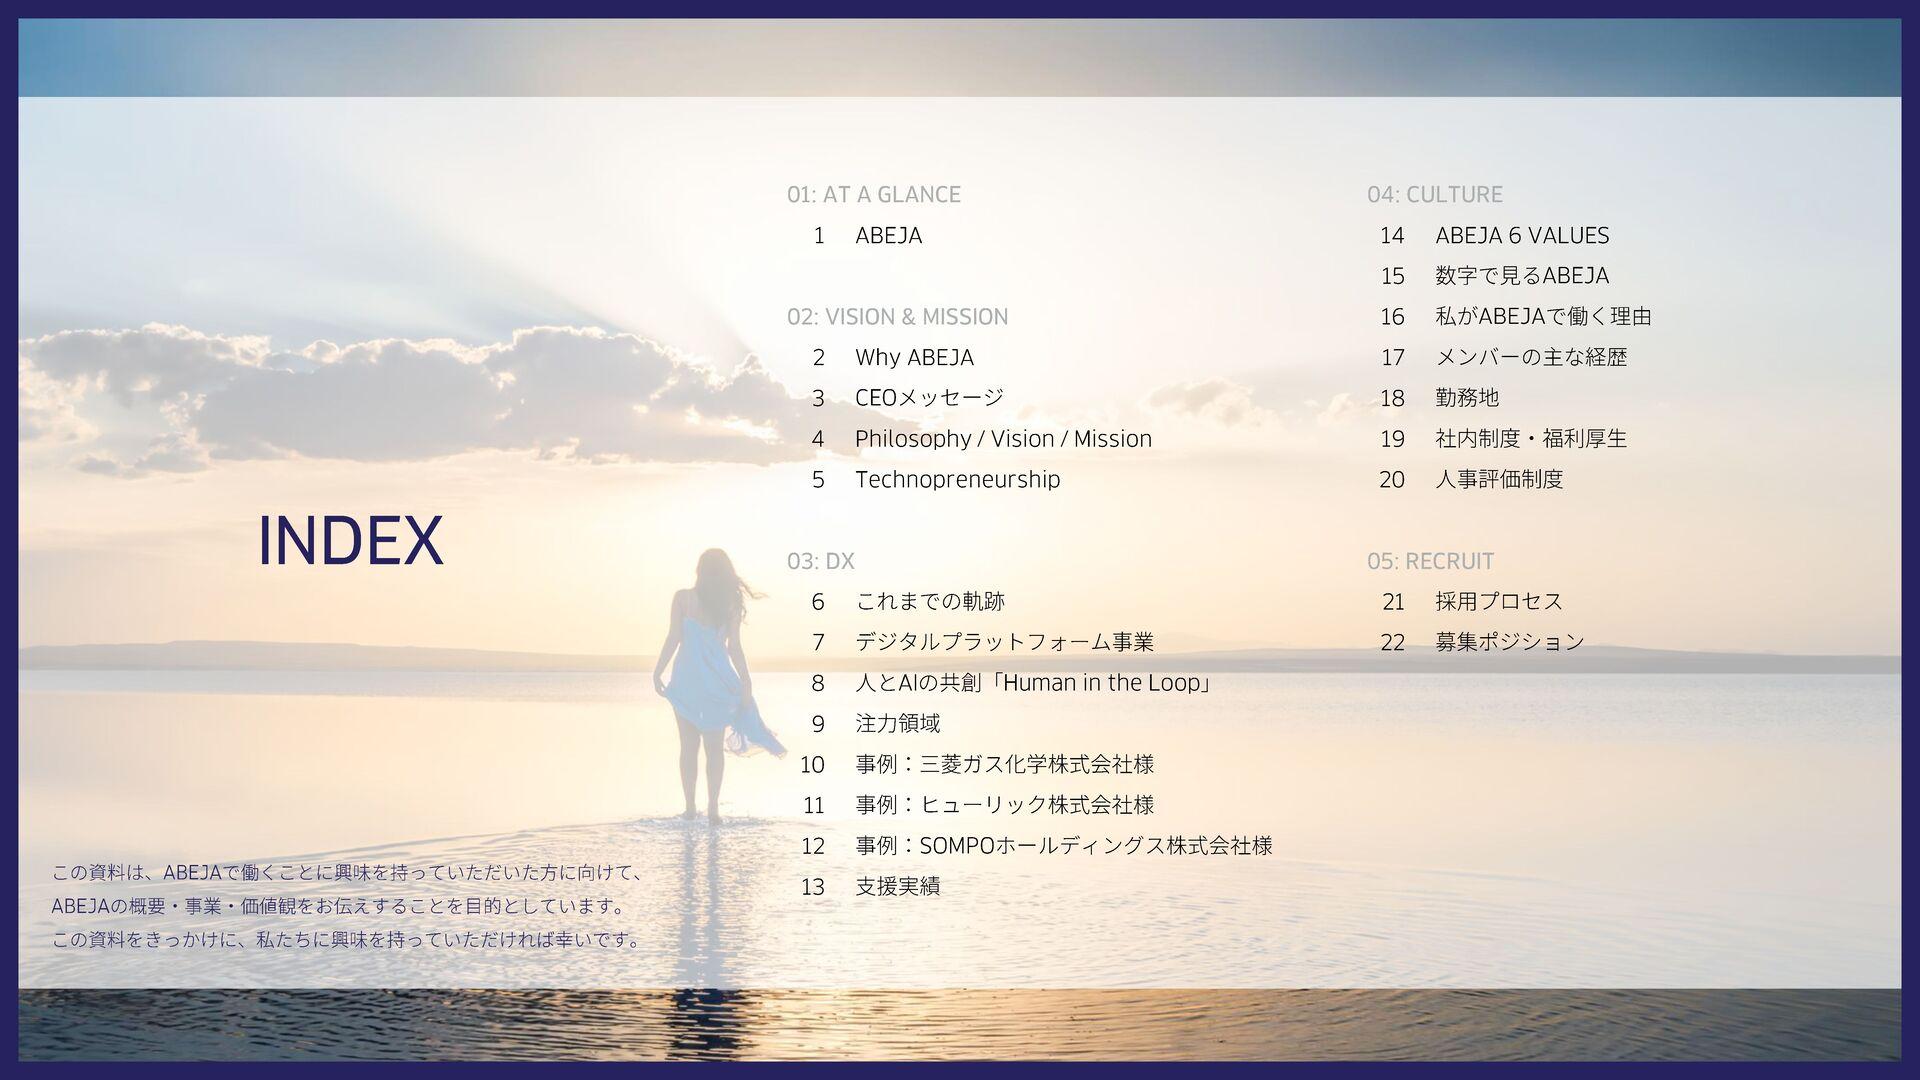 Contents. 1. Corporate Profile 2. Business 3. T...